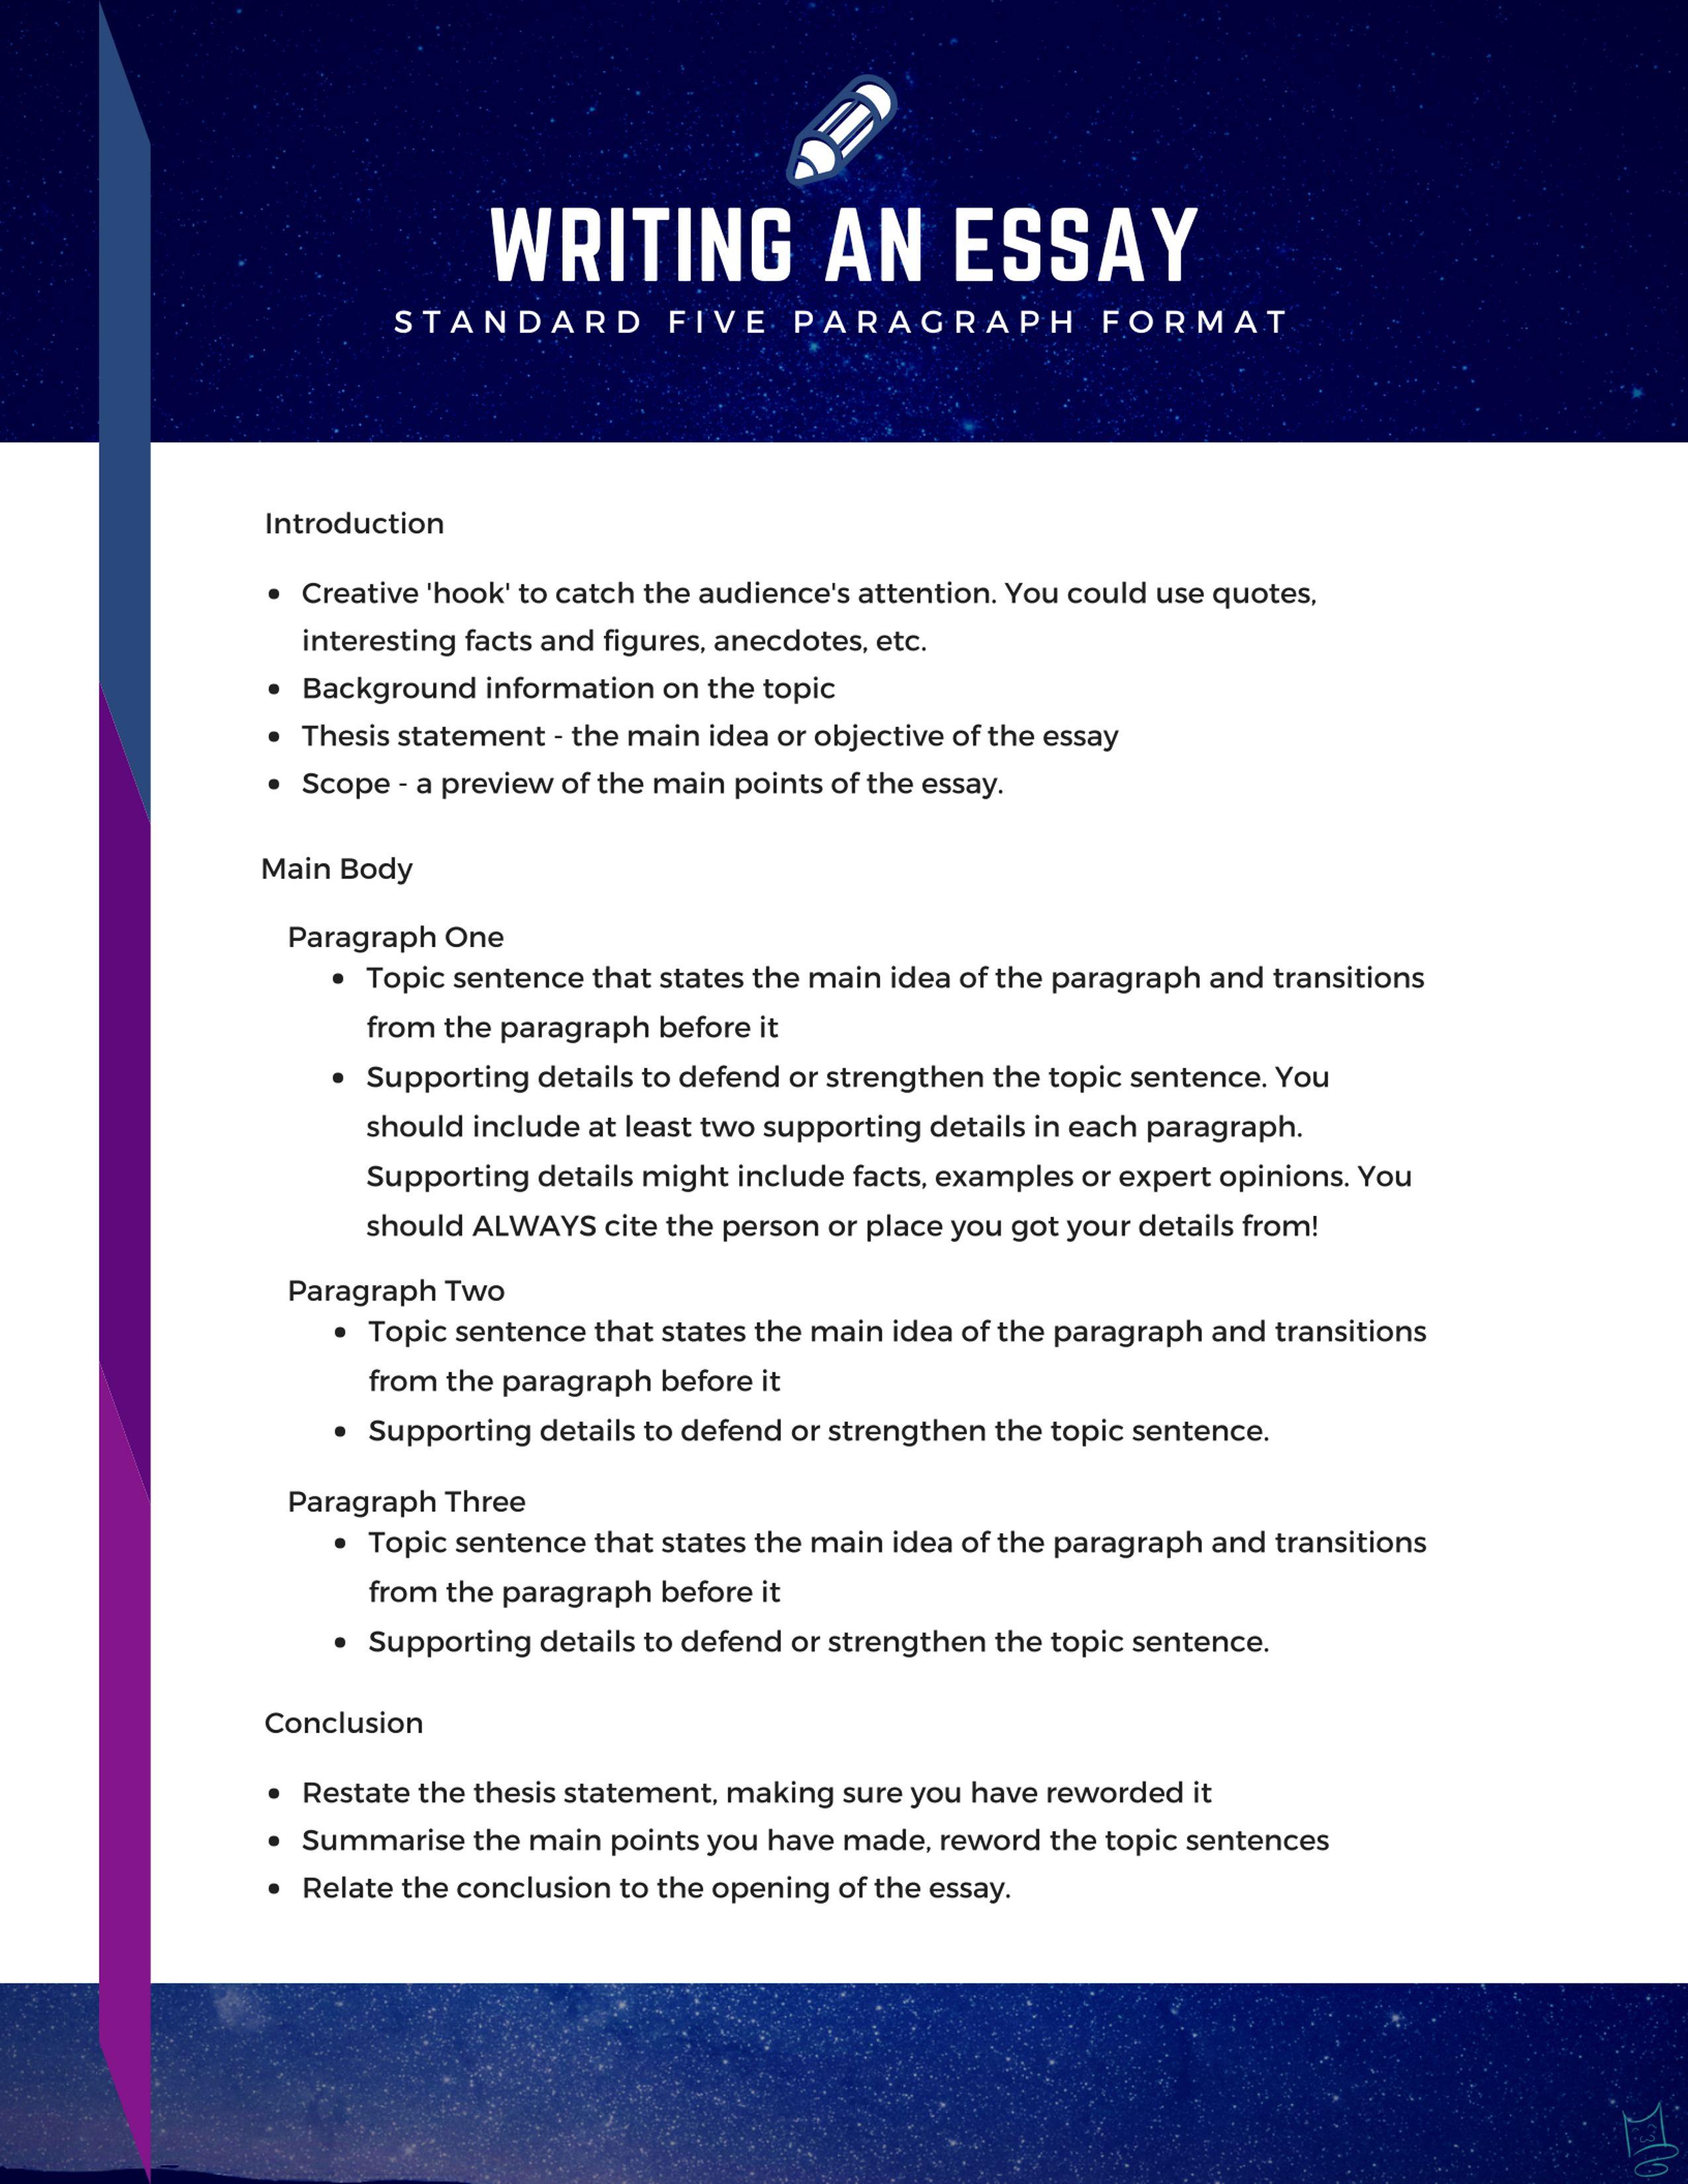 Custom admissions essays for sale